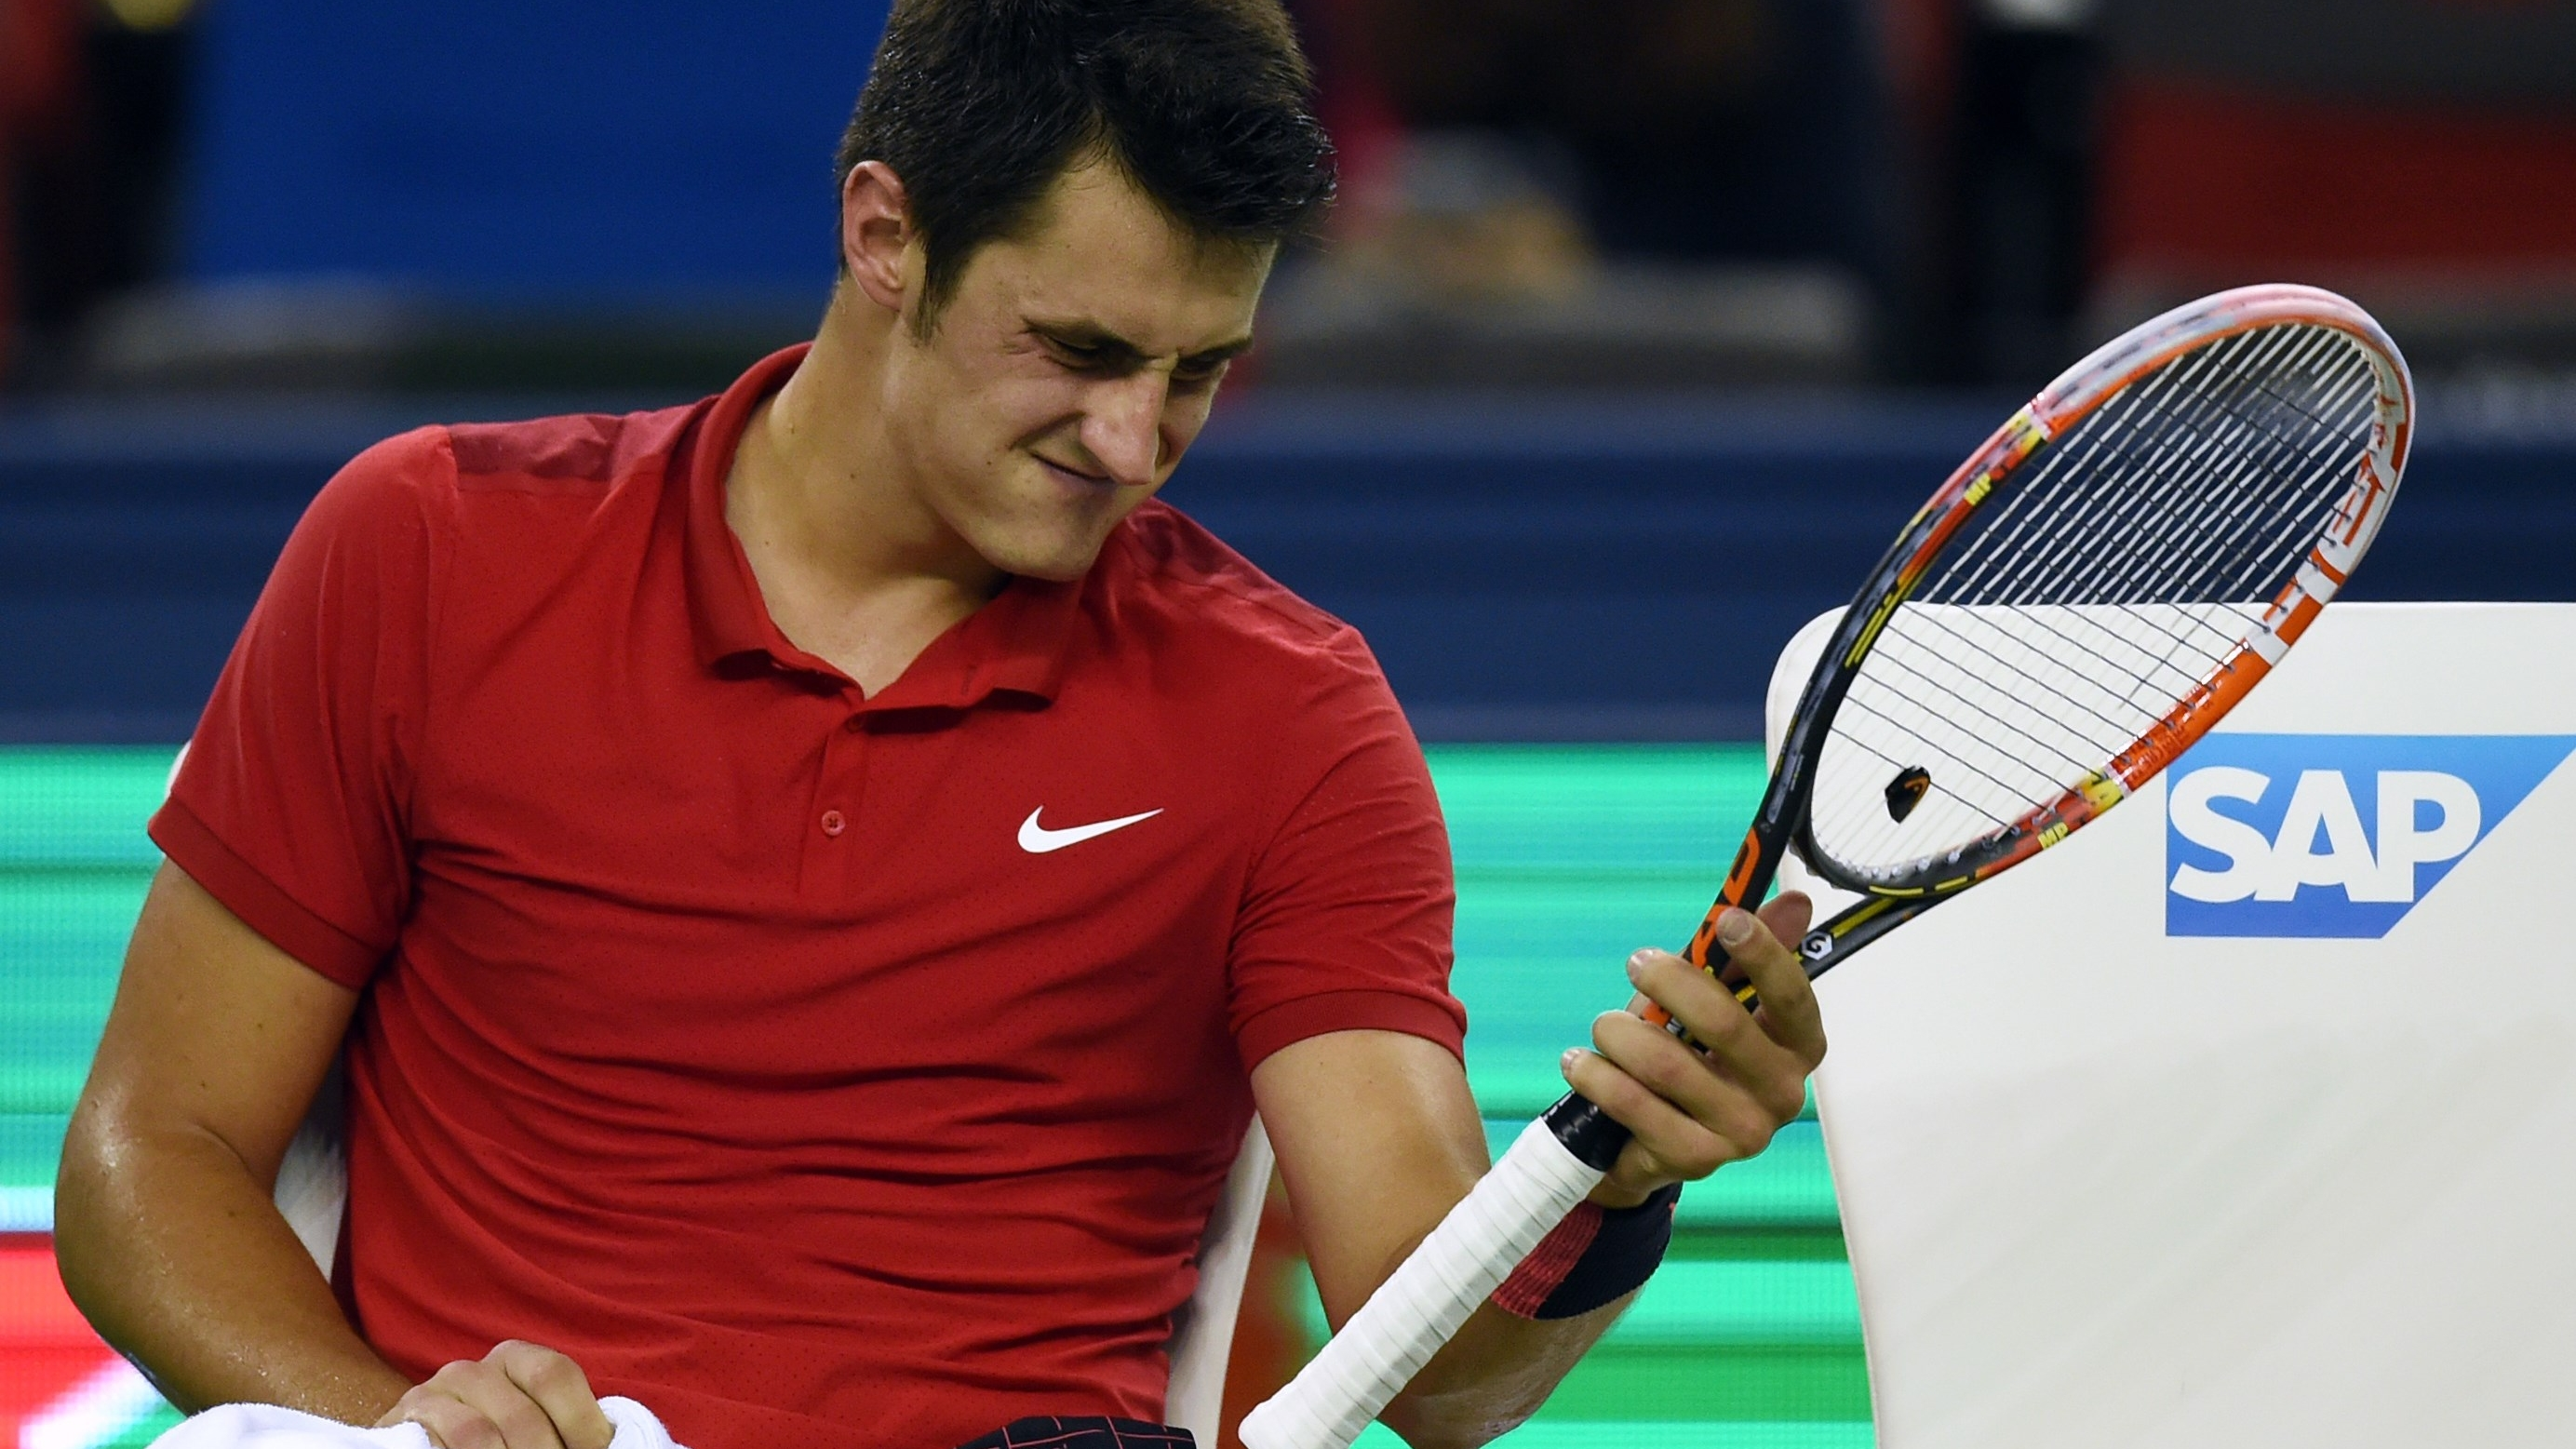 Tomic Shot Down By Veteran Baghdatis Tennis Sporting News